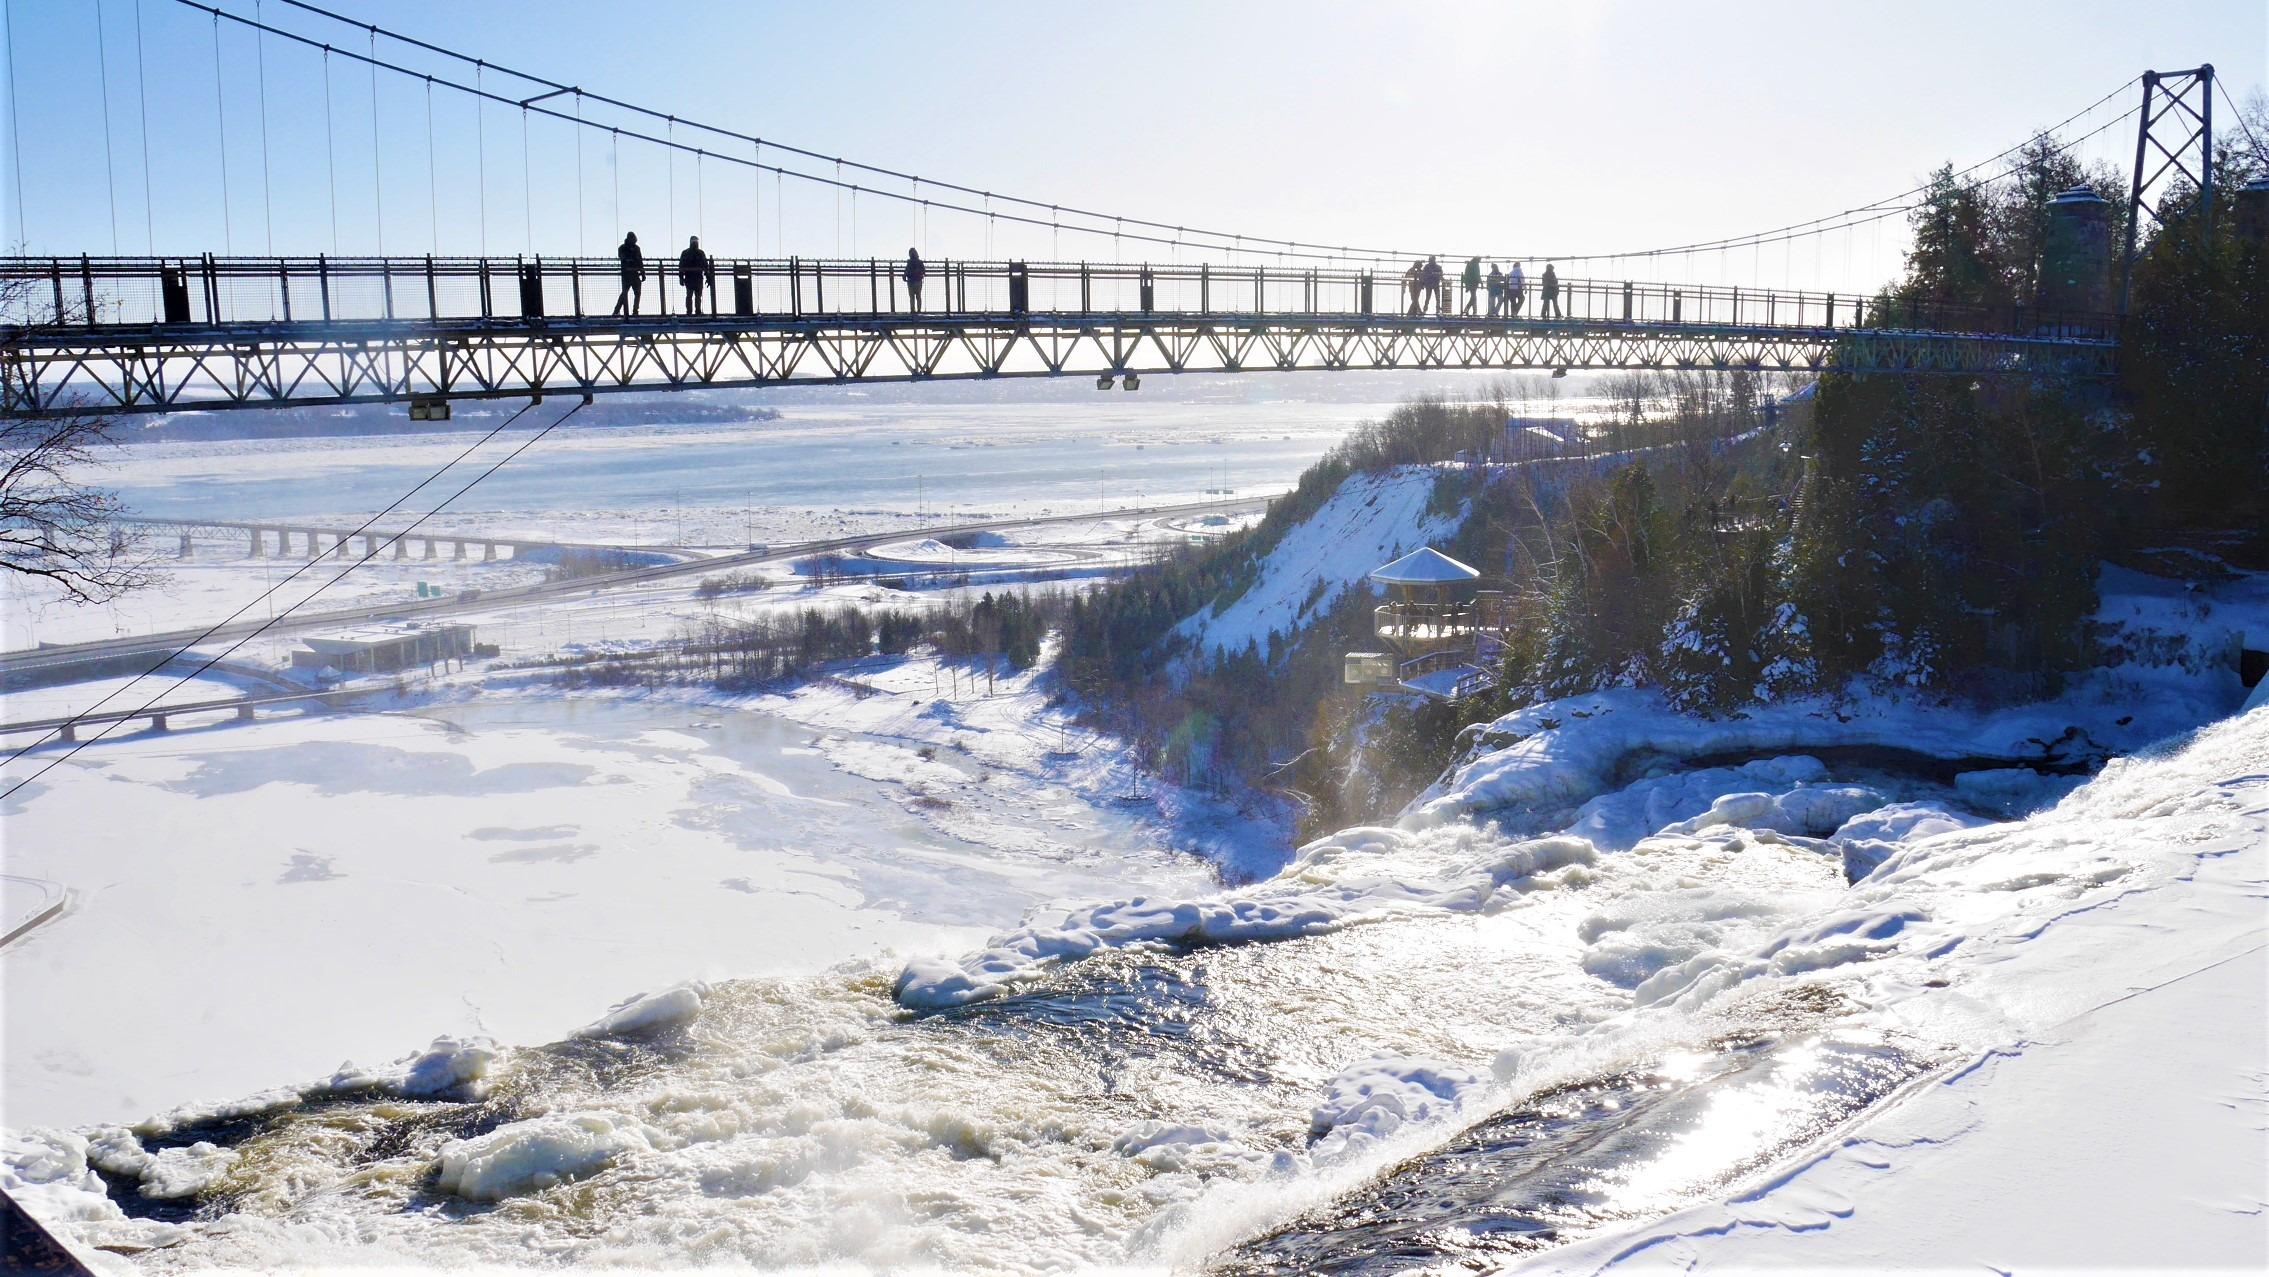 Quebec Chutes Montmorency hiver infos pratiques blog voyage canada arpenter le chemin